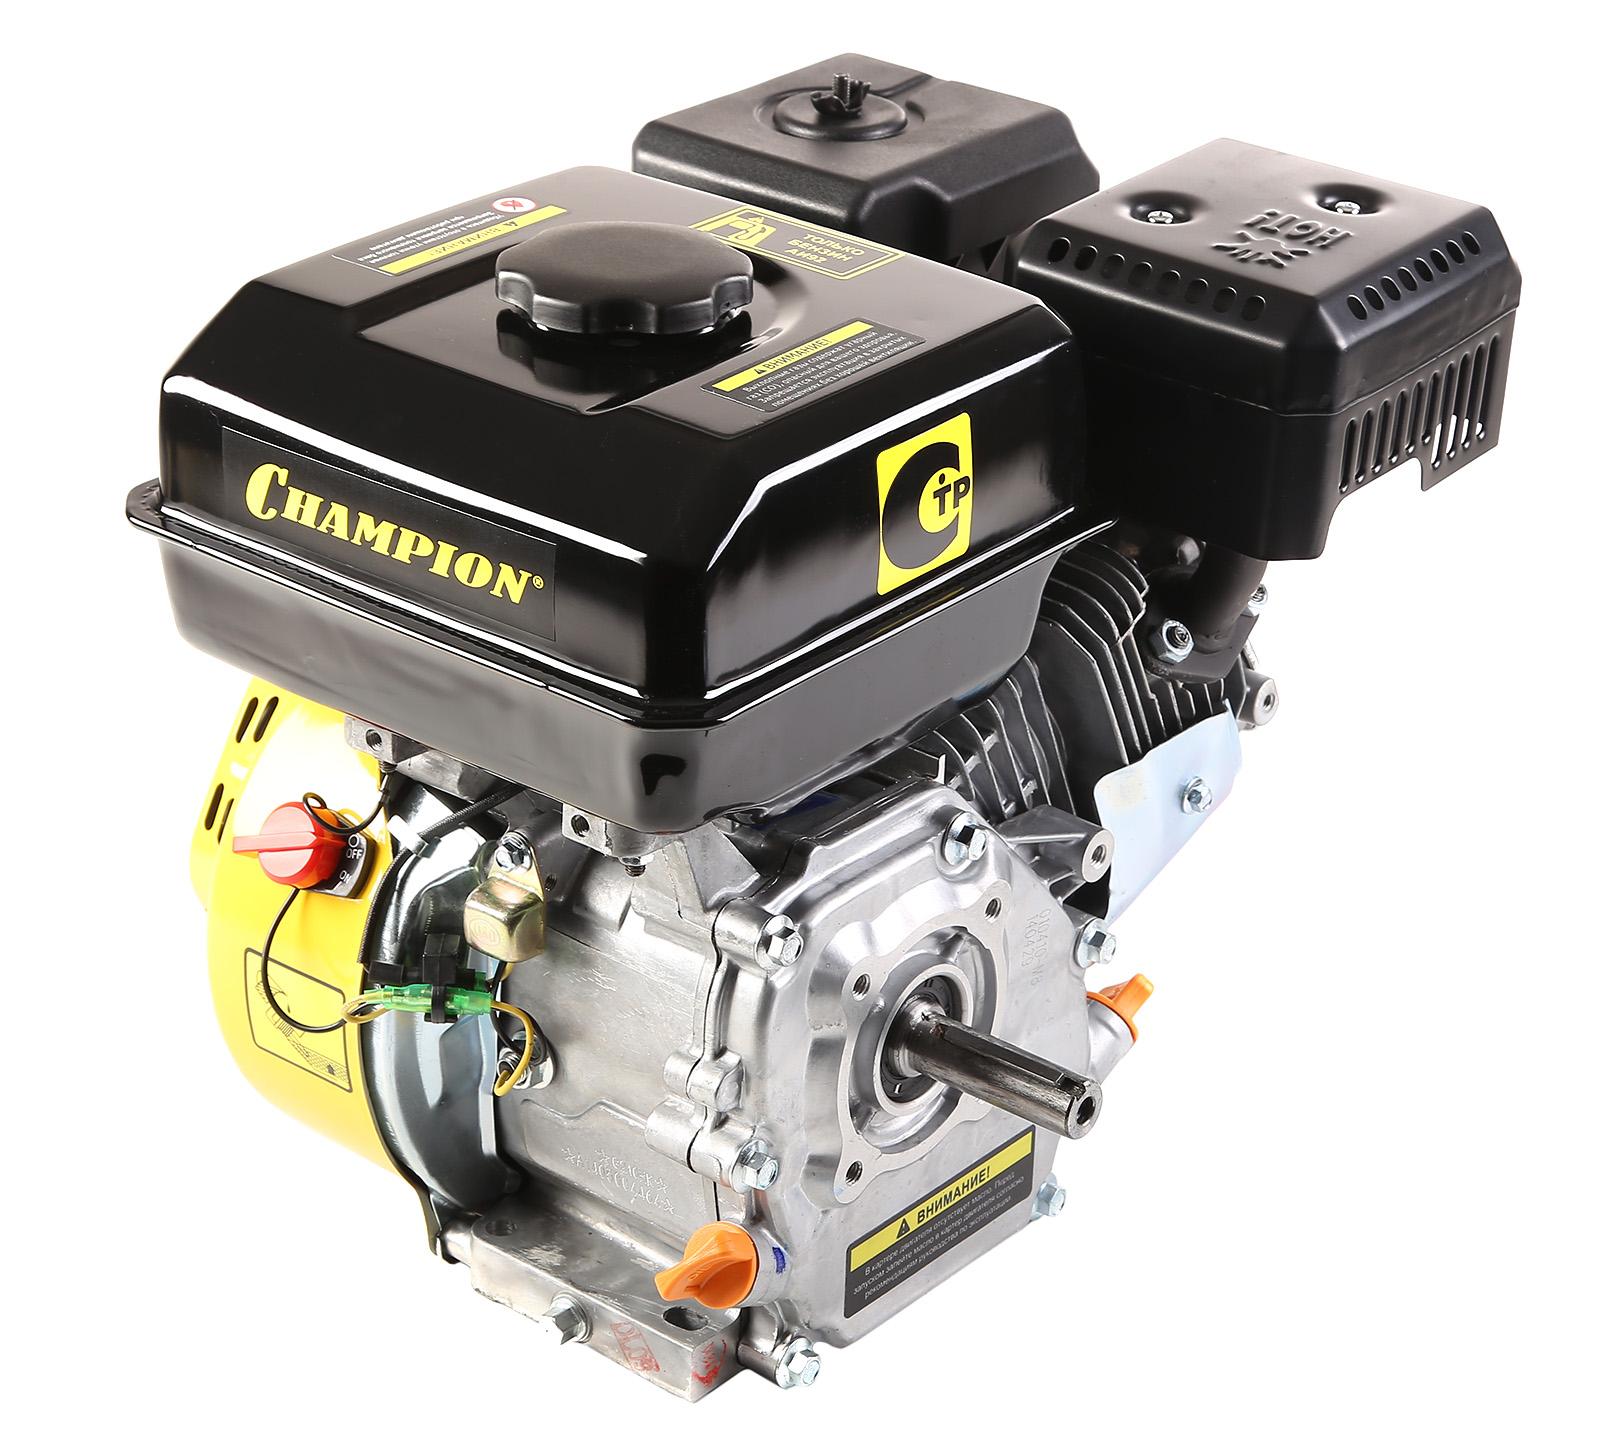 Двигатель Champion G210hk домкрат белак бак 00038 50т